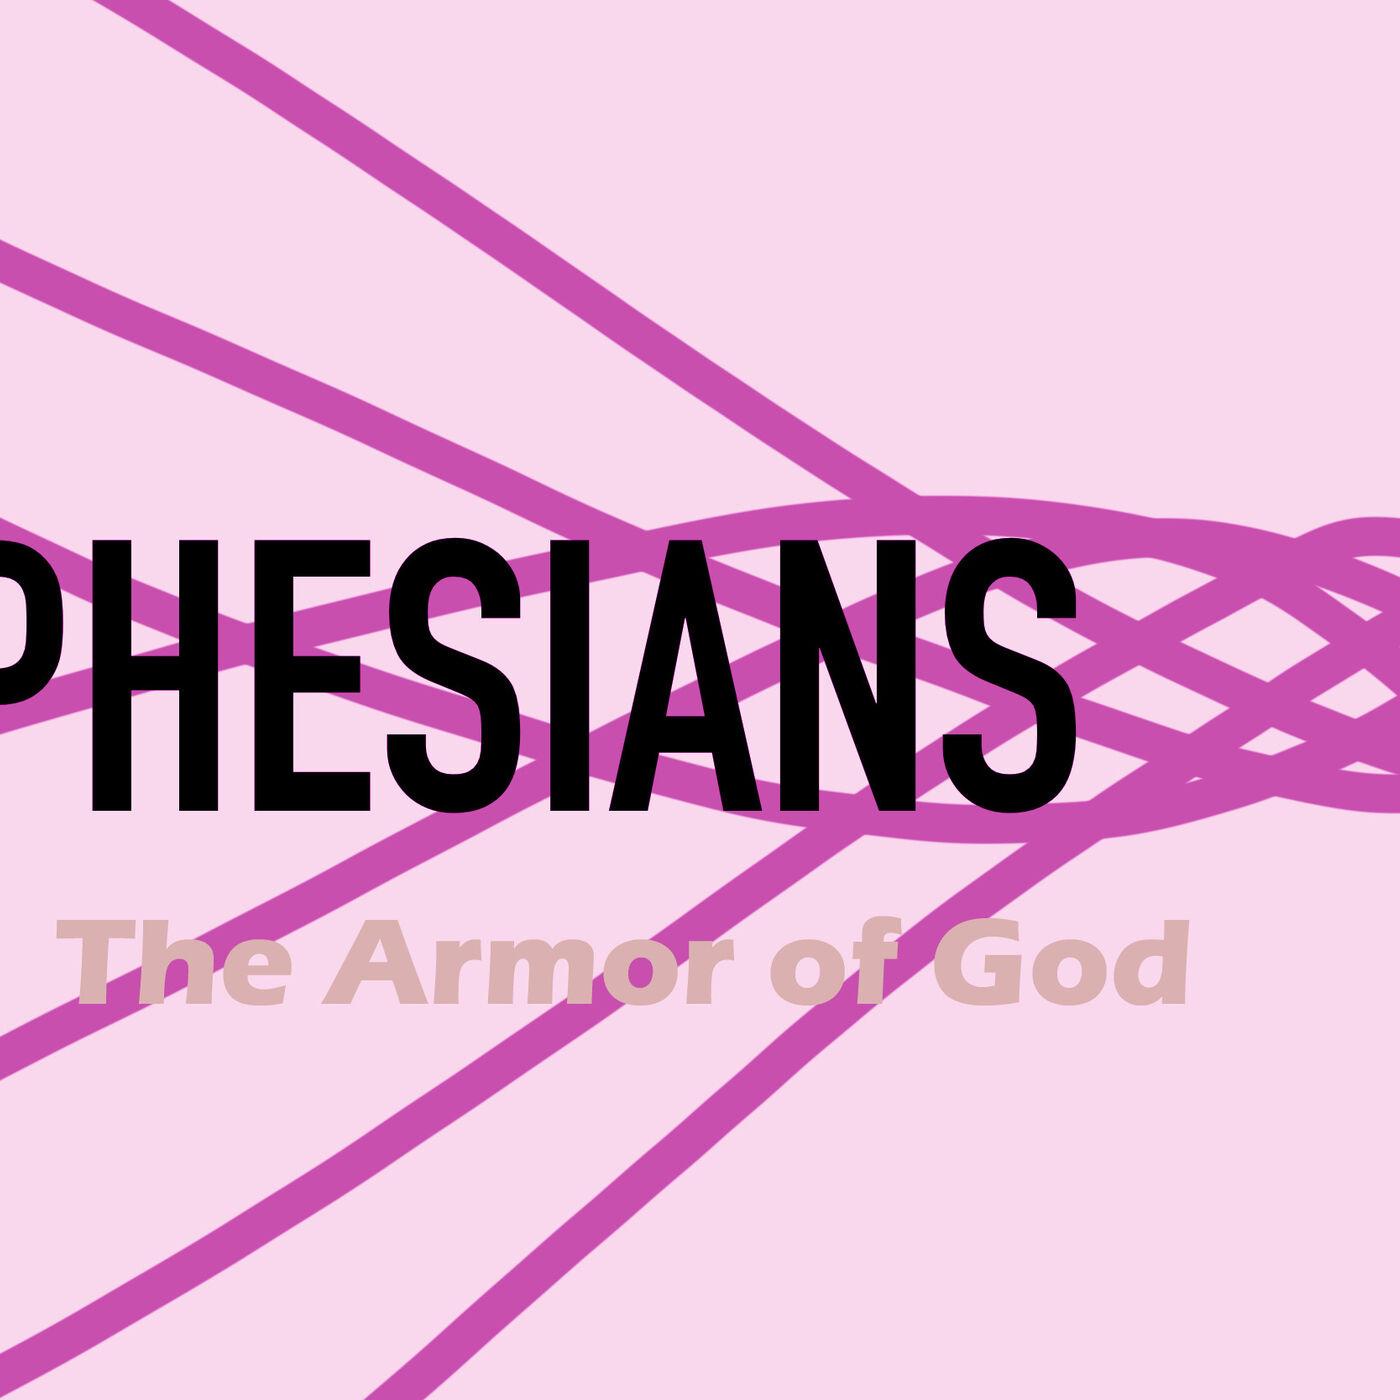 Ephesians 6 - Armor of God